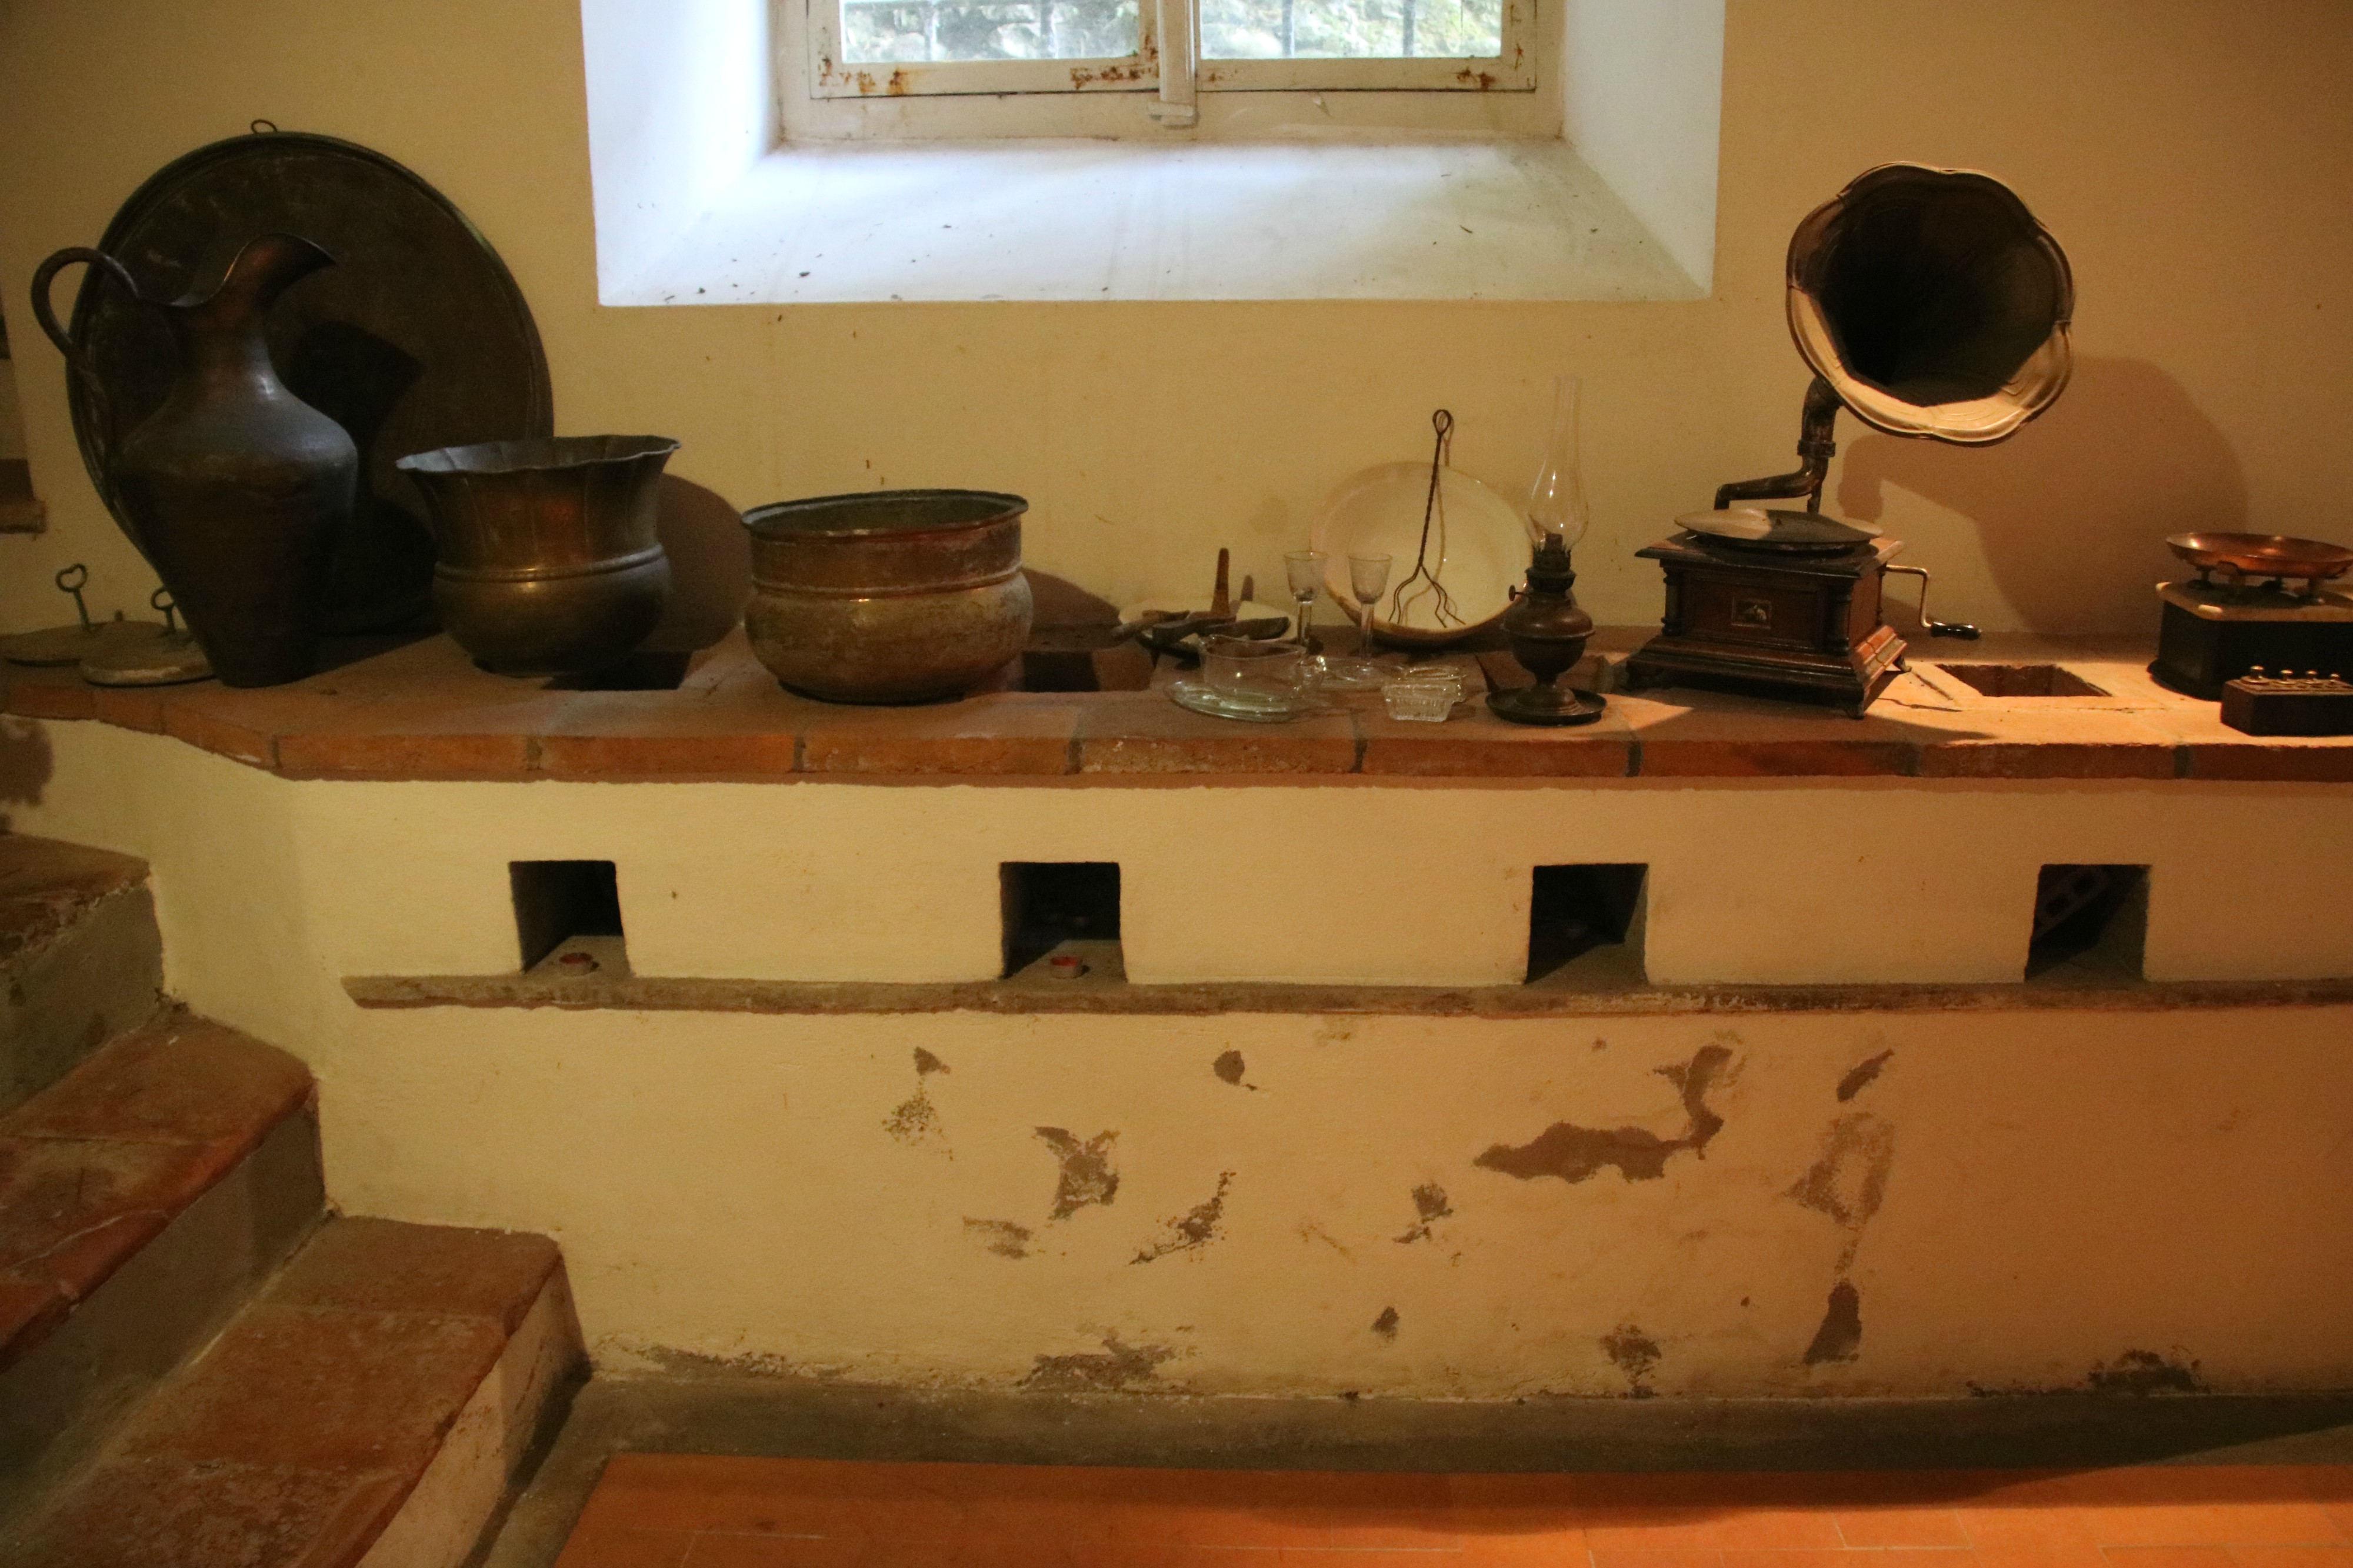 File:Bagni di Lucca, Villa Webb, vecchia cucina 05.jpg ...